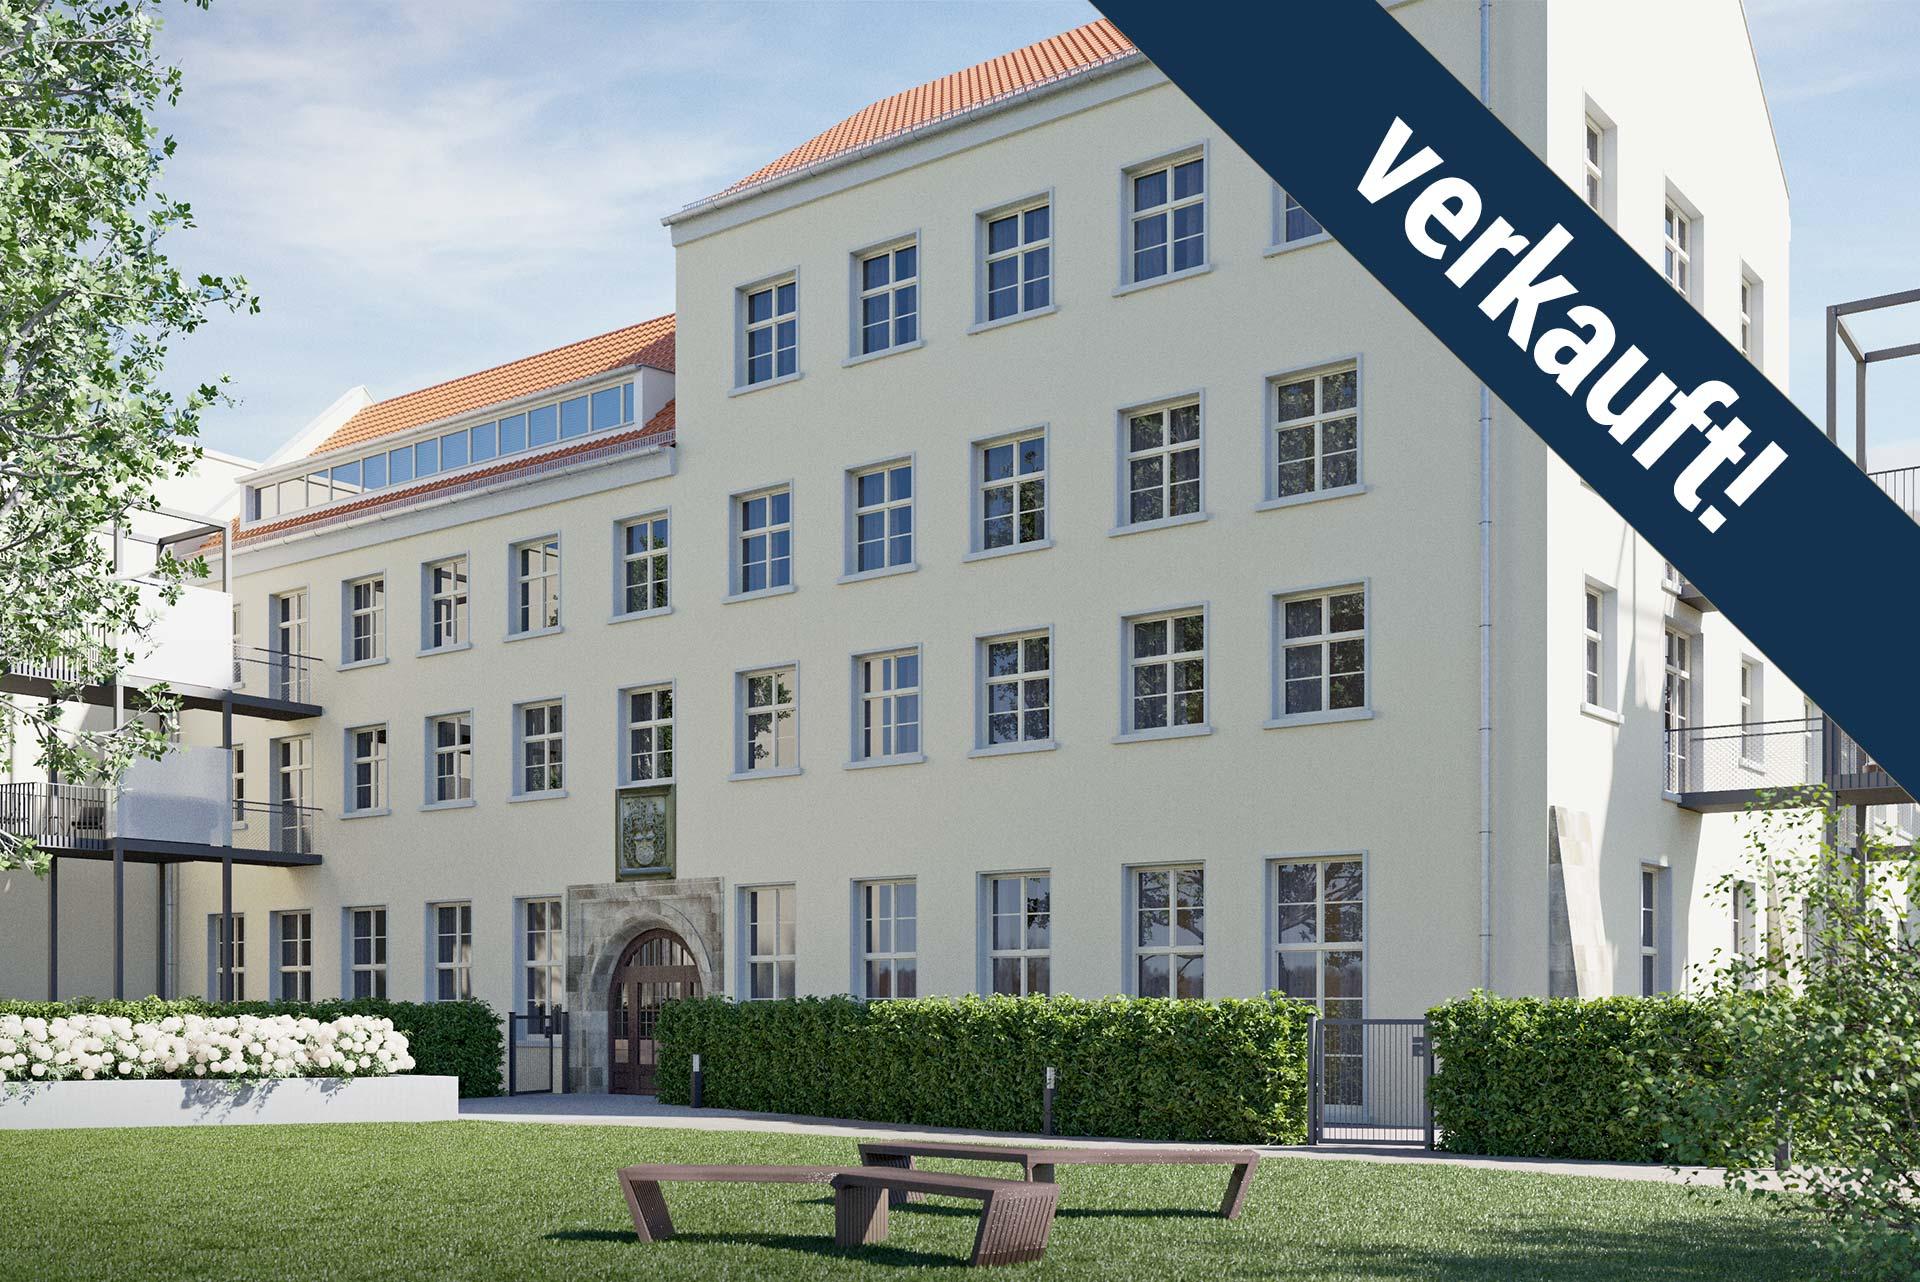 eigentumswohnung in erfurt altstadt immobilien verkaufen by tilman friedrich aus erfurt. Black Bedroom Furniture Sets. Home Design Ideas